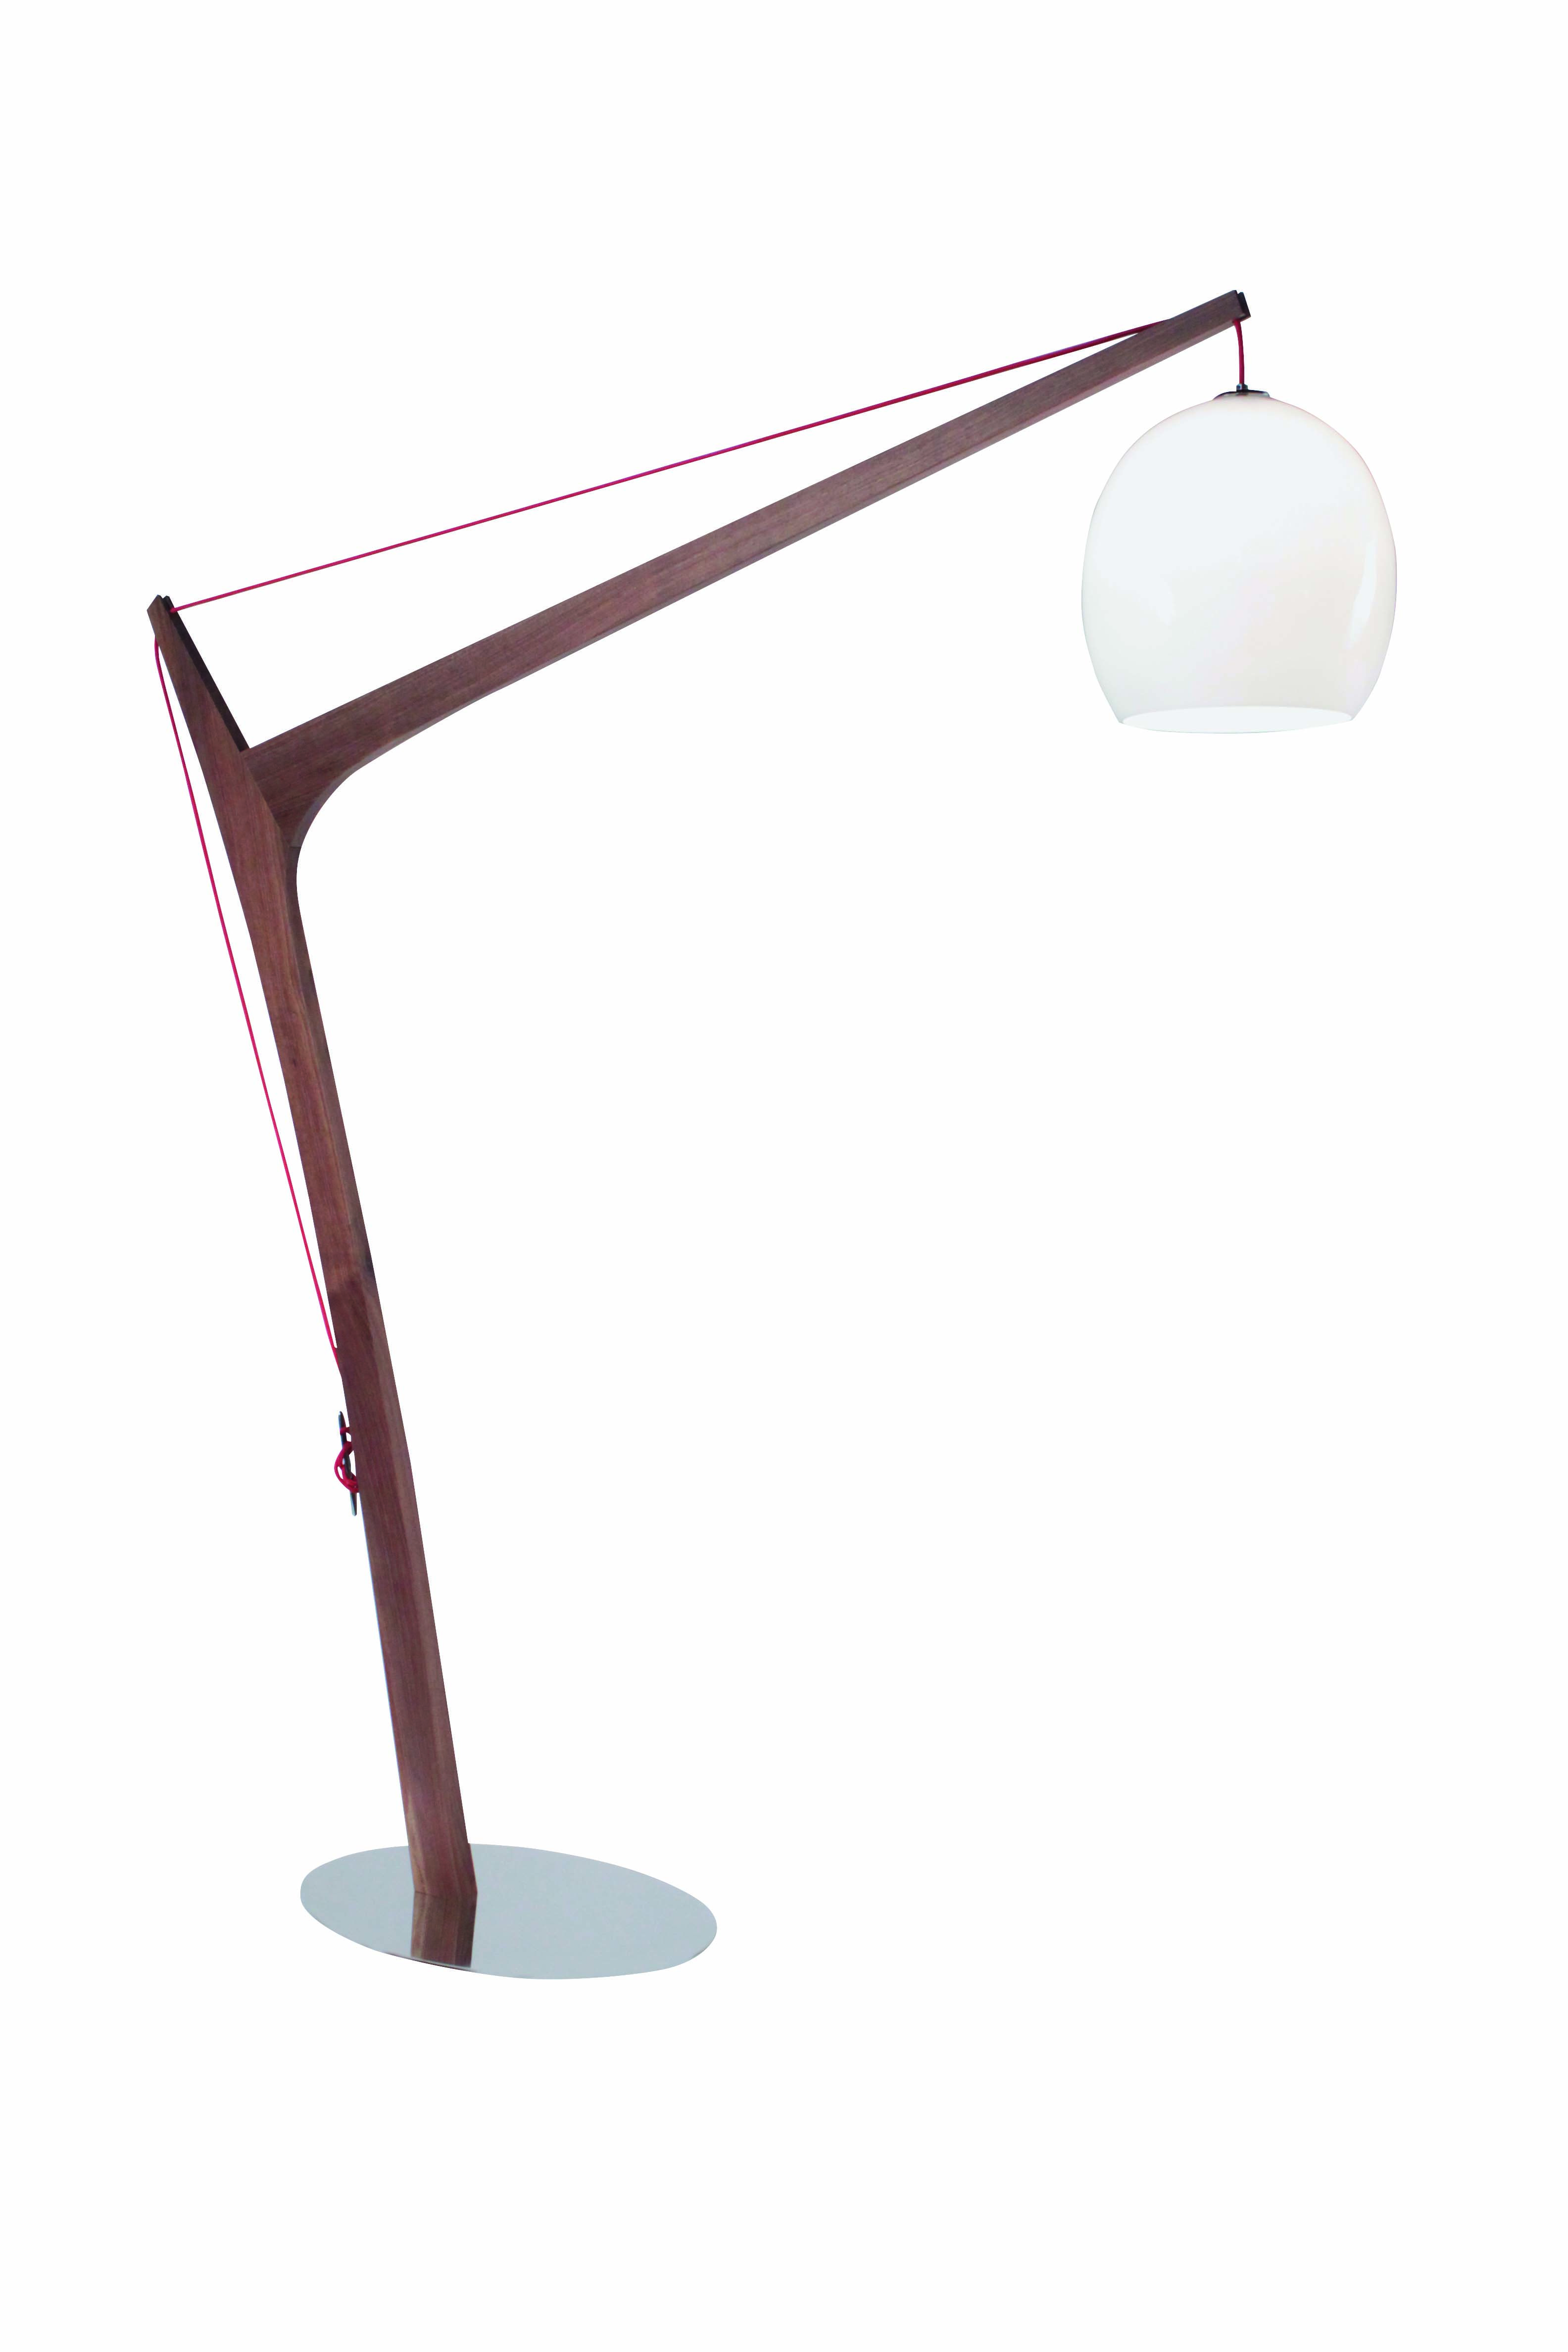 Accastillage Floor Lamp Stainless Steel Base Walnut